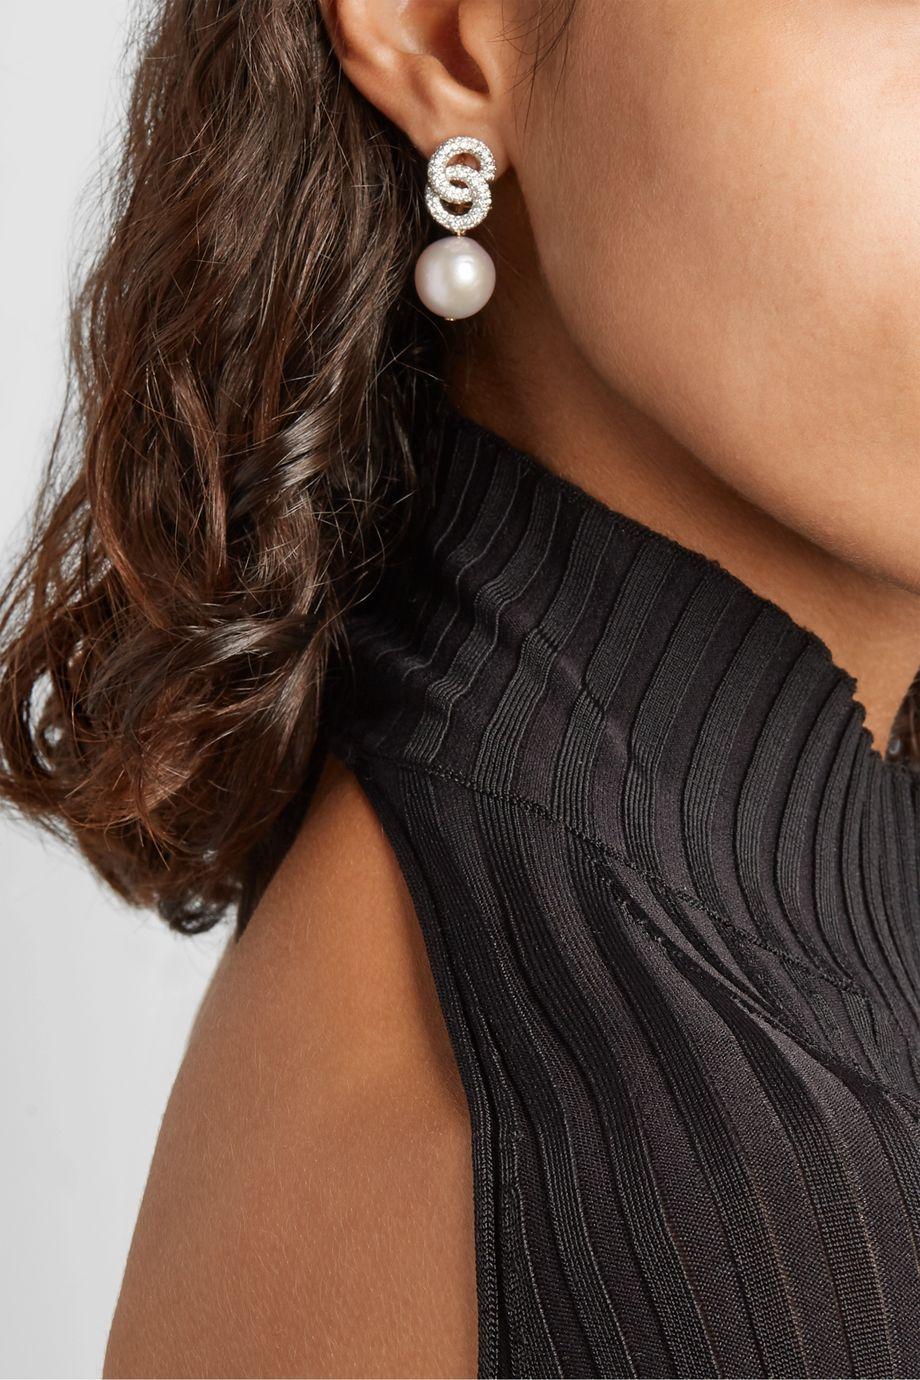 Bina Goenka 18-karat gold diamond and pearl earrings